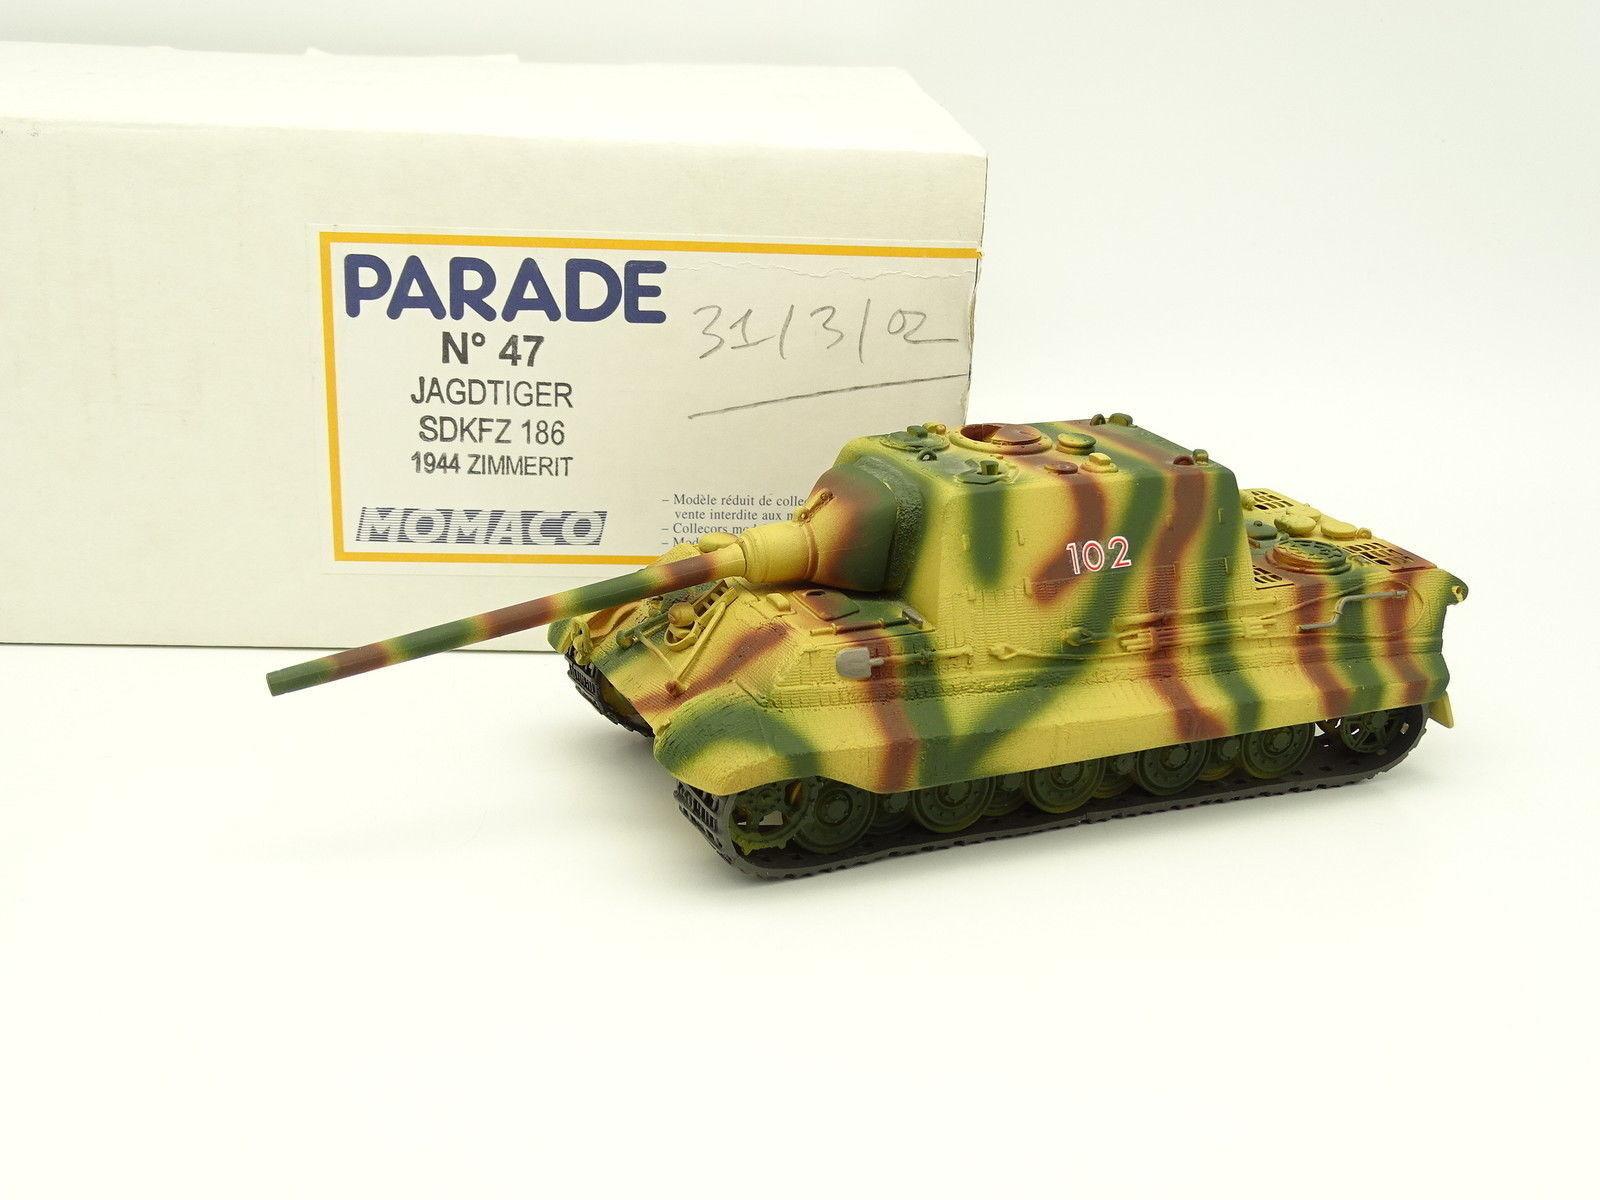 Parade Militaire Armée 1 50 - Char Tank Jagdtiger SDKFZ 186 1944 Zimmerit